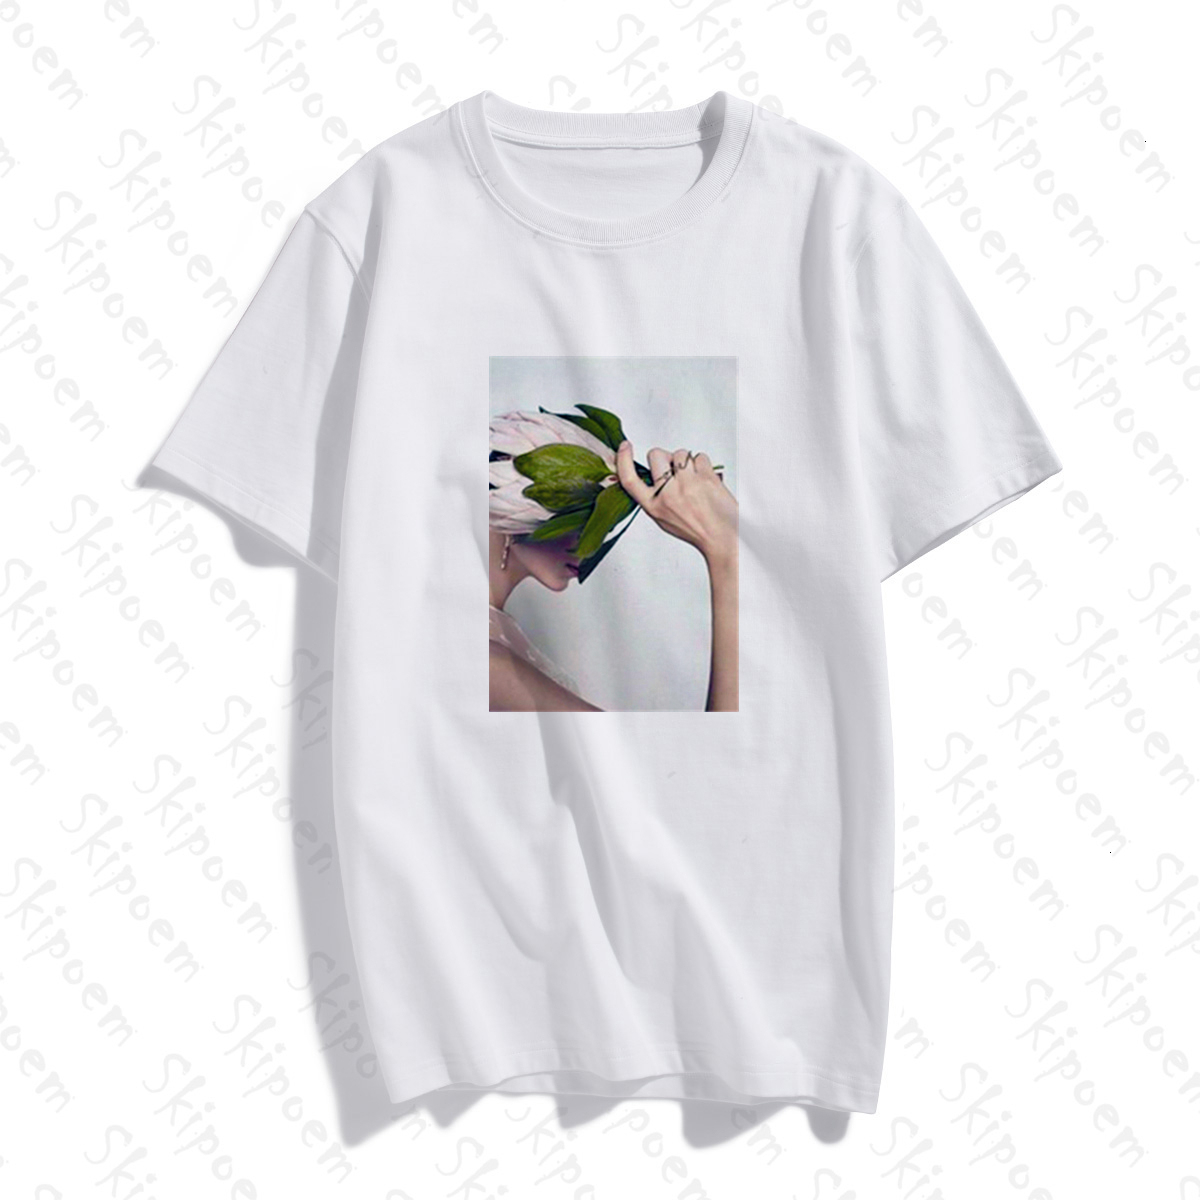 2020 New Flower Leaf T-shirt Women Kawaii Vintage Tumblr Punk Gothic Aesthetic Plus Size Short Sleeve Cotton Clothes Streetwear